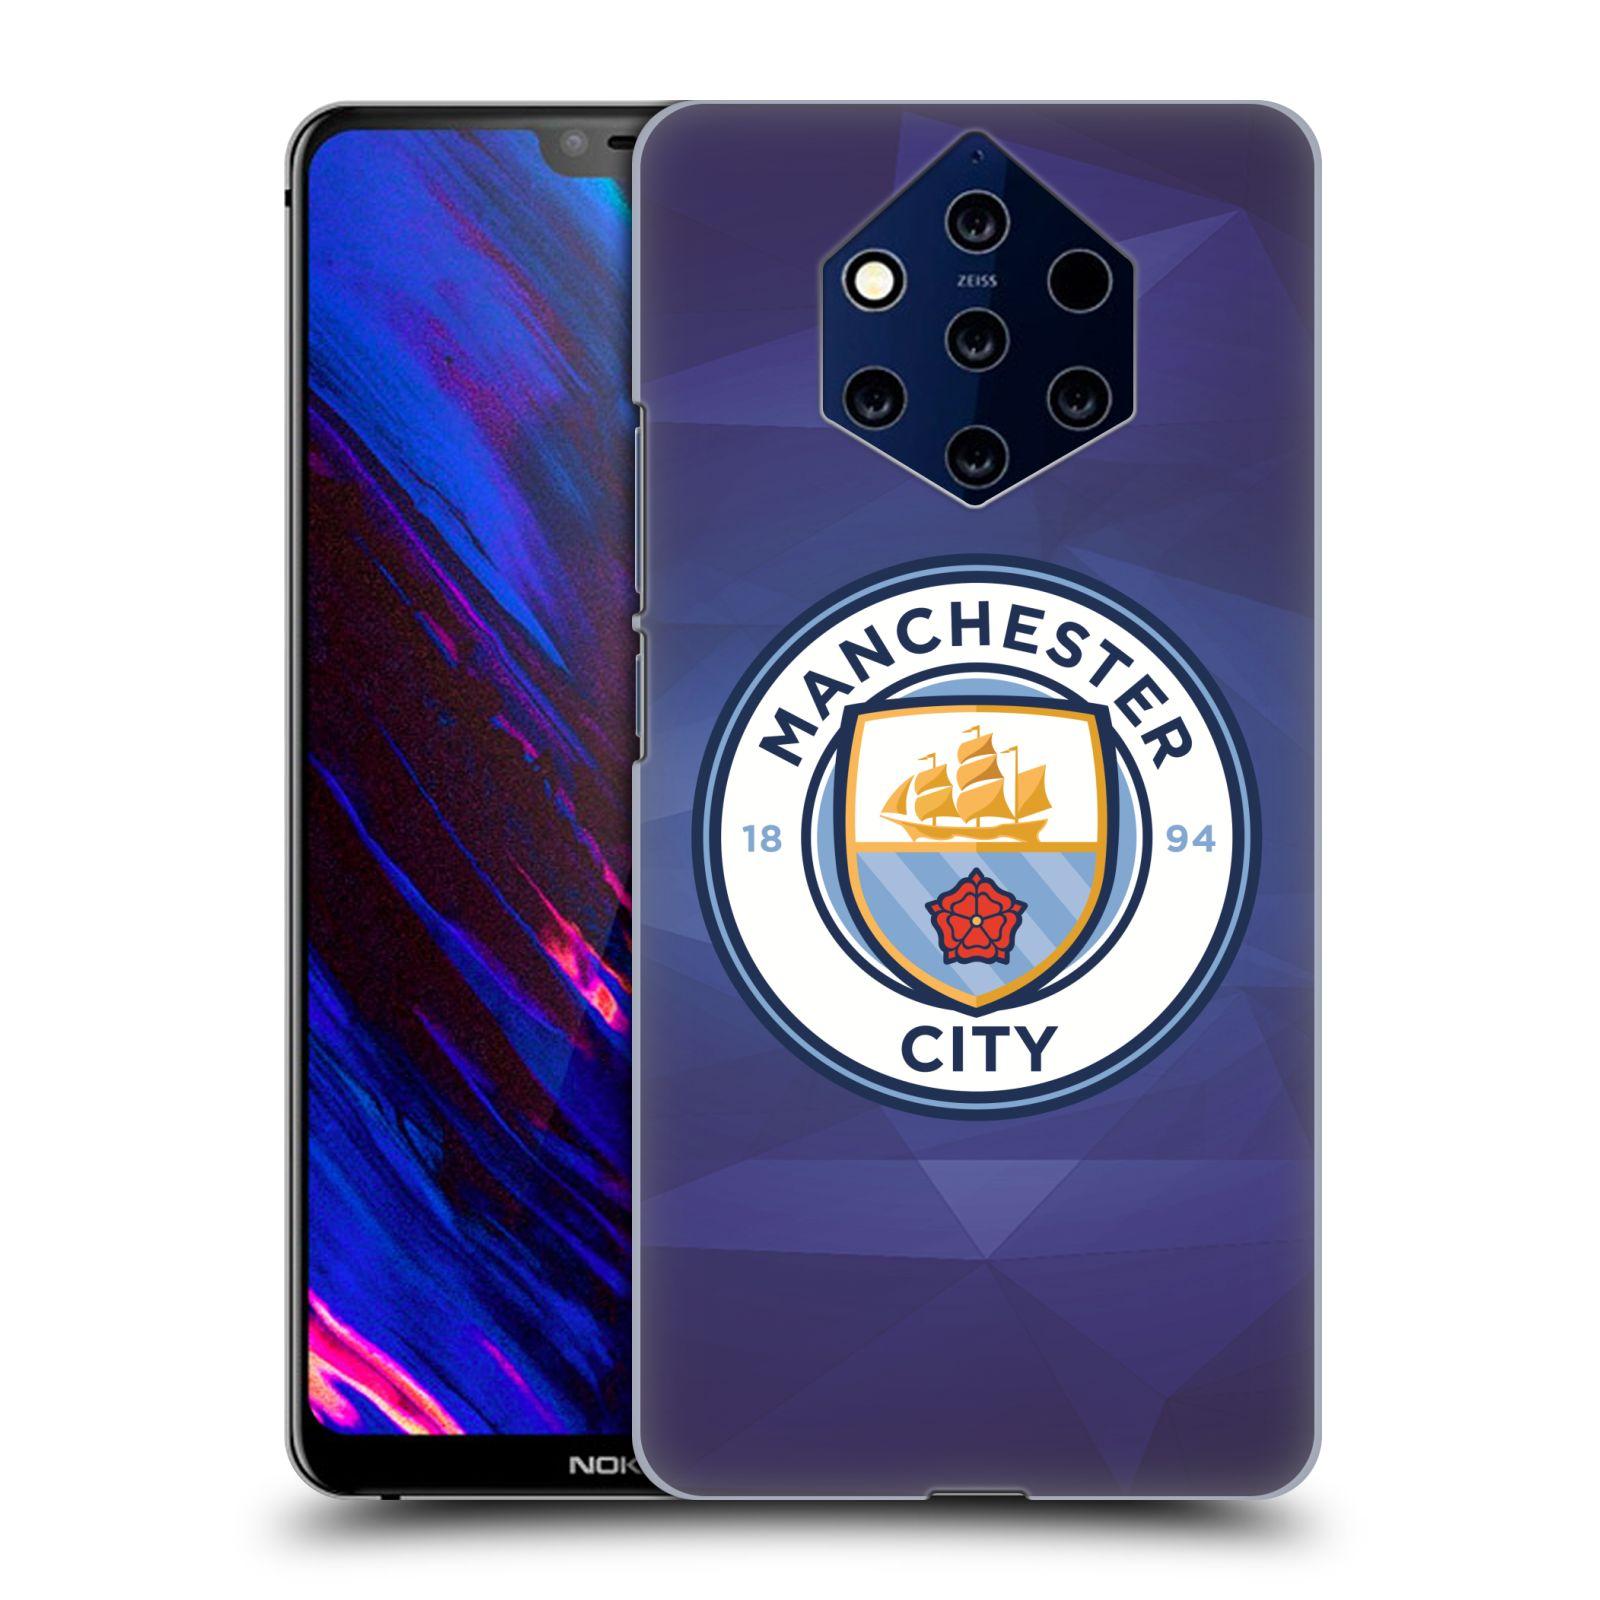 Plastové pouzdro na mobil Nokia 9 PureView - Head Case - Manchester City FC - Modré nové logo